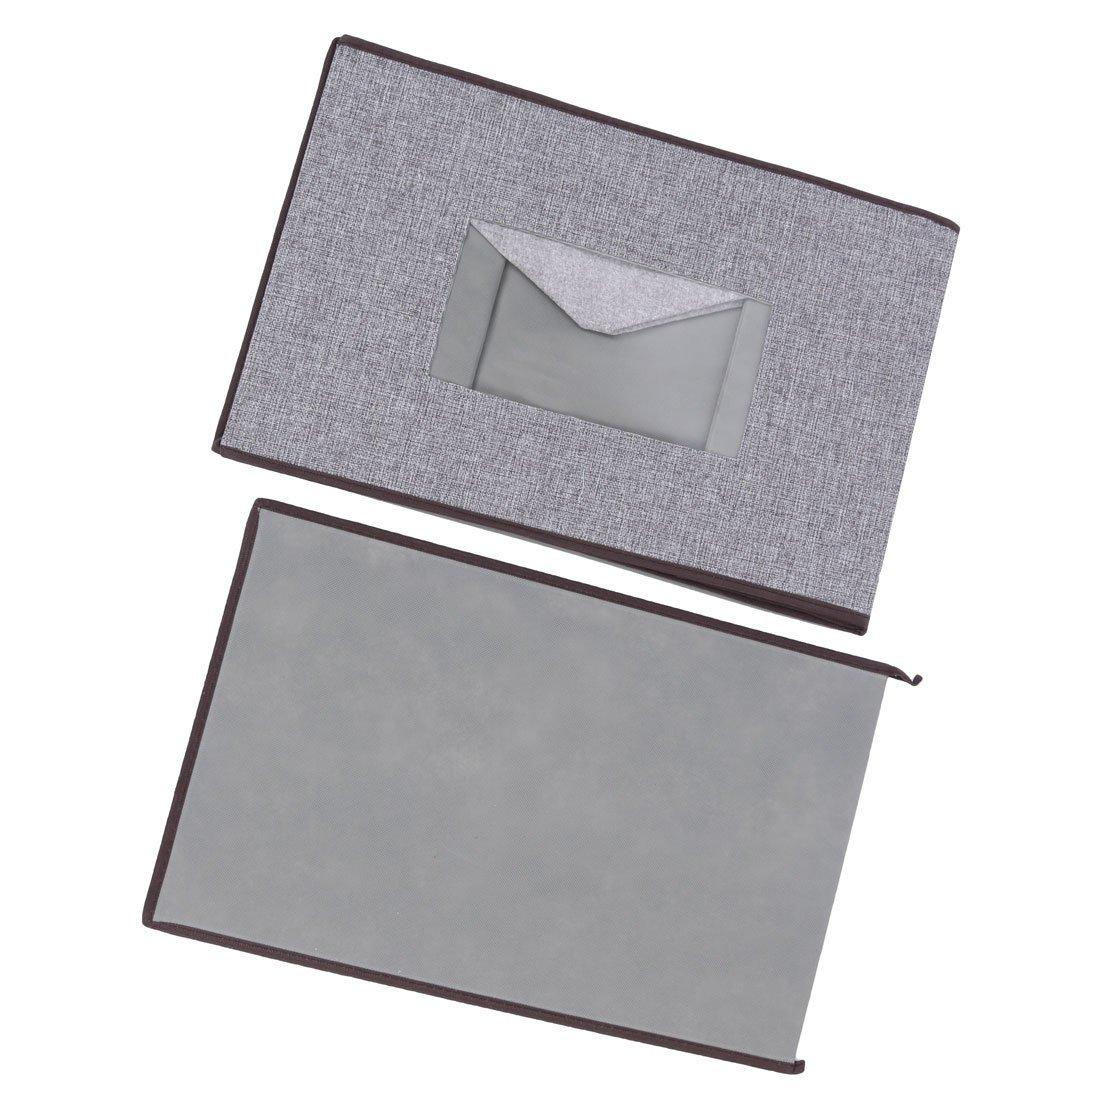 Amazon.com : eDealMax lino plegable Familia Escudo Titular del edredón caja de Libro de caja de almacenamiento DE 49 x 32 x 31 cm Gris : Office Products